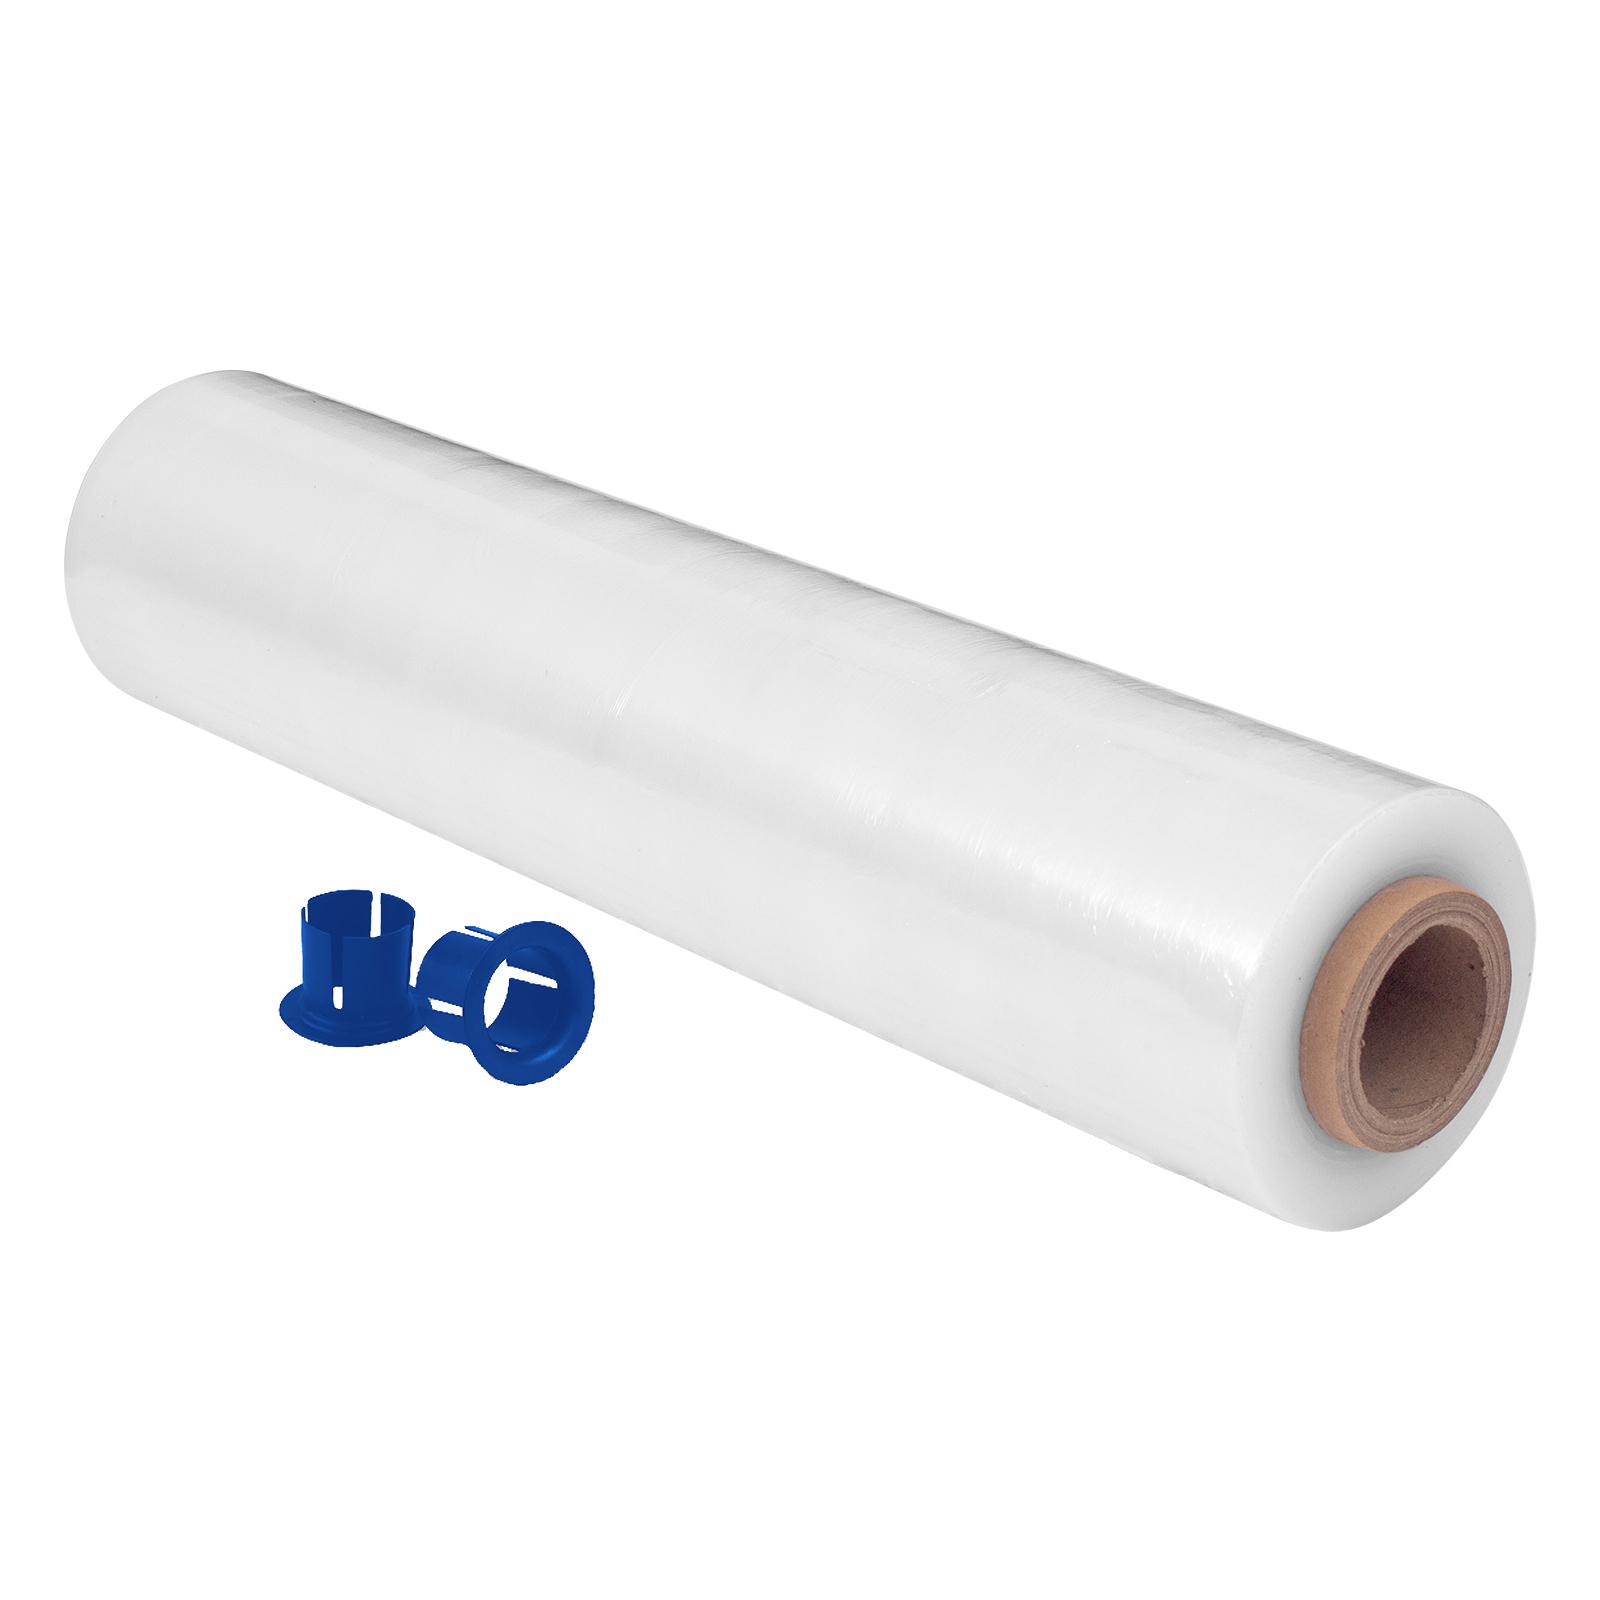 Wrap & Move 500mm x 280m Clear Pallet Shrink Wrap